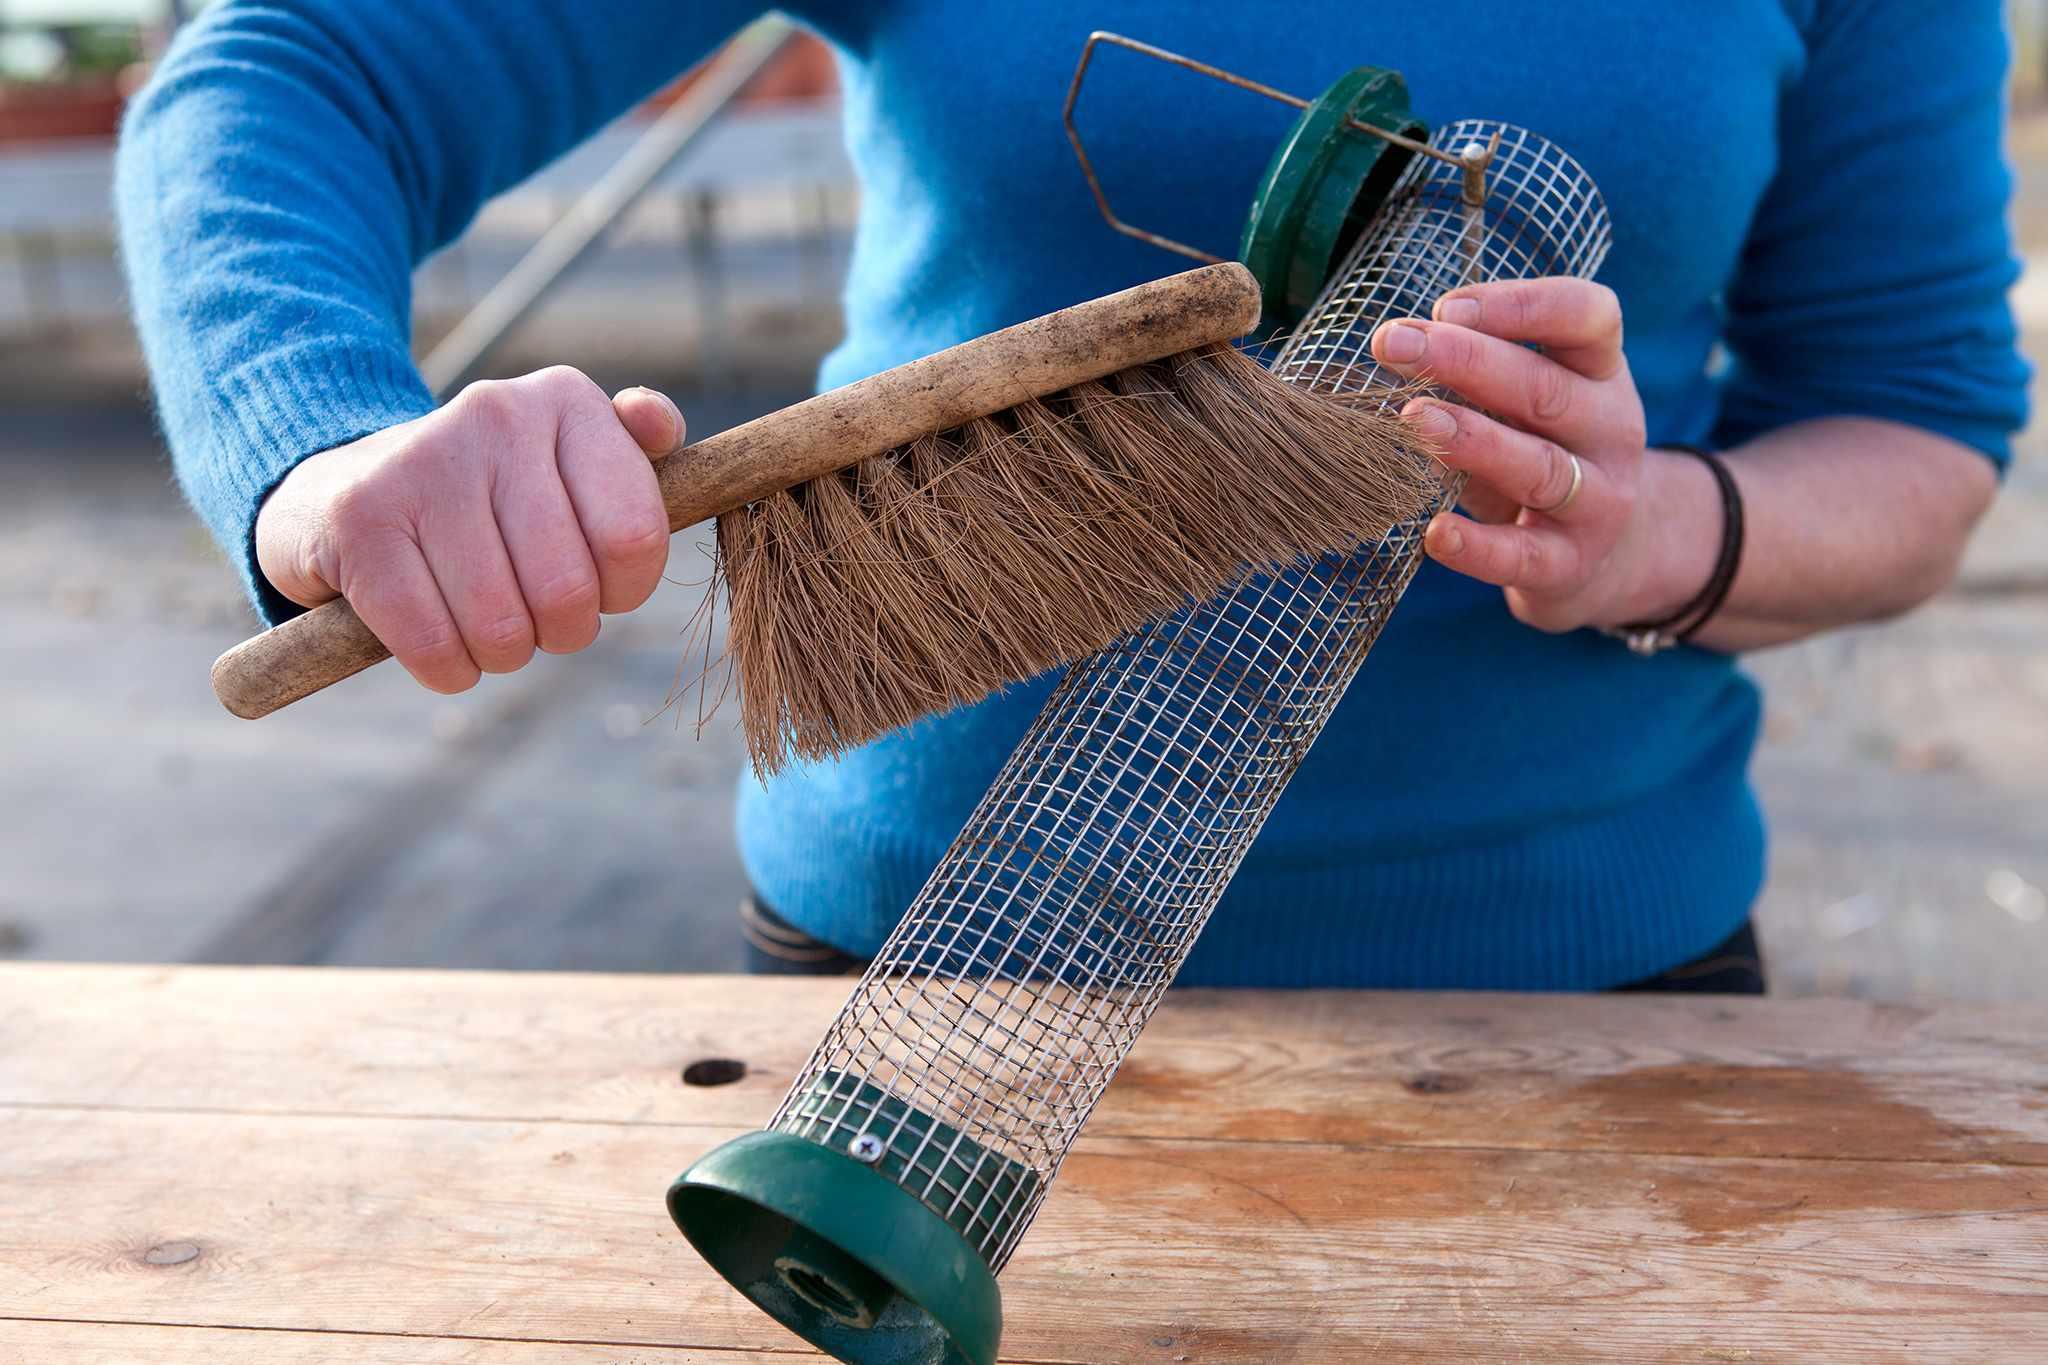 Cleaning a bird feeder